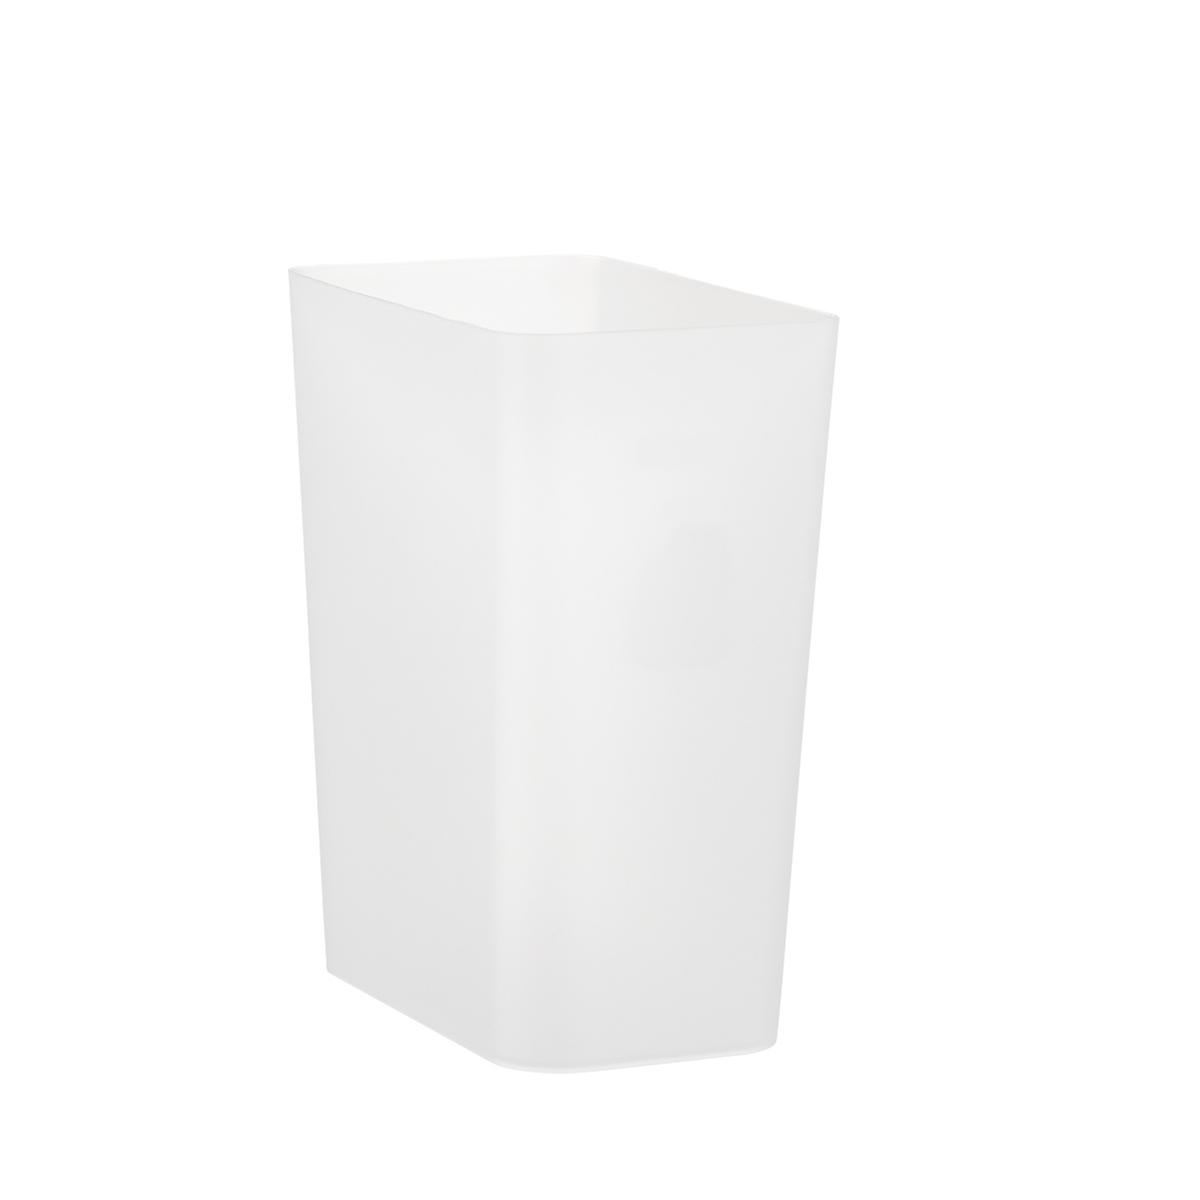 Small Translucent Rectangular Wastebasket